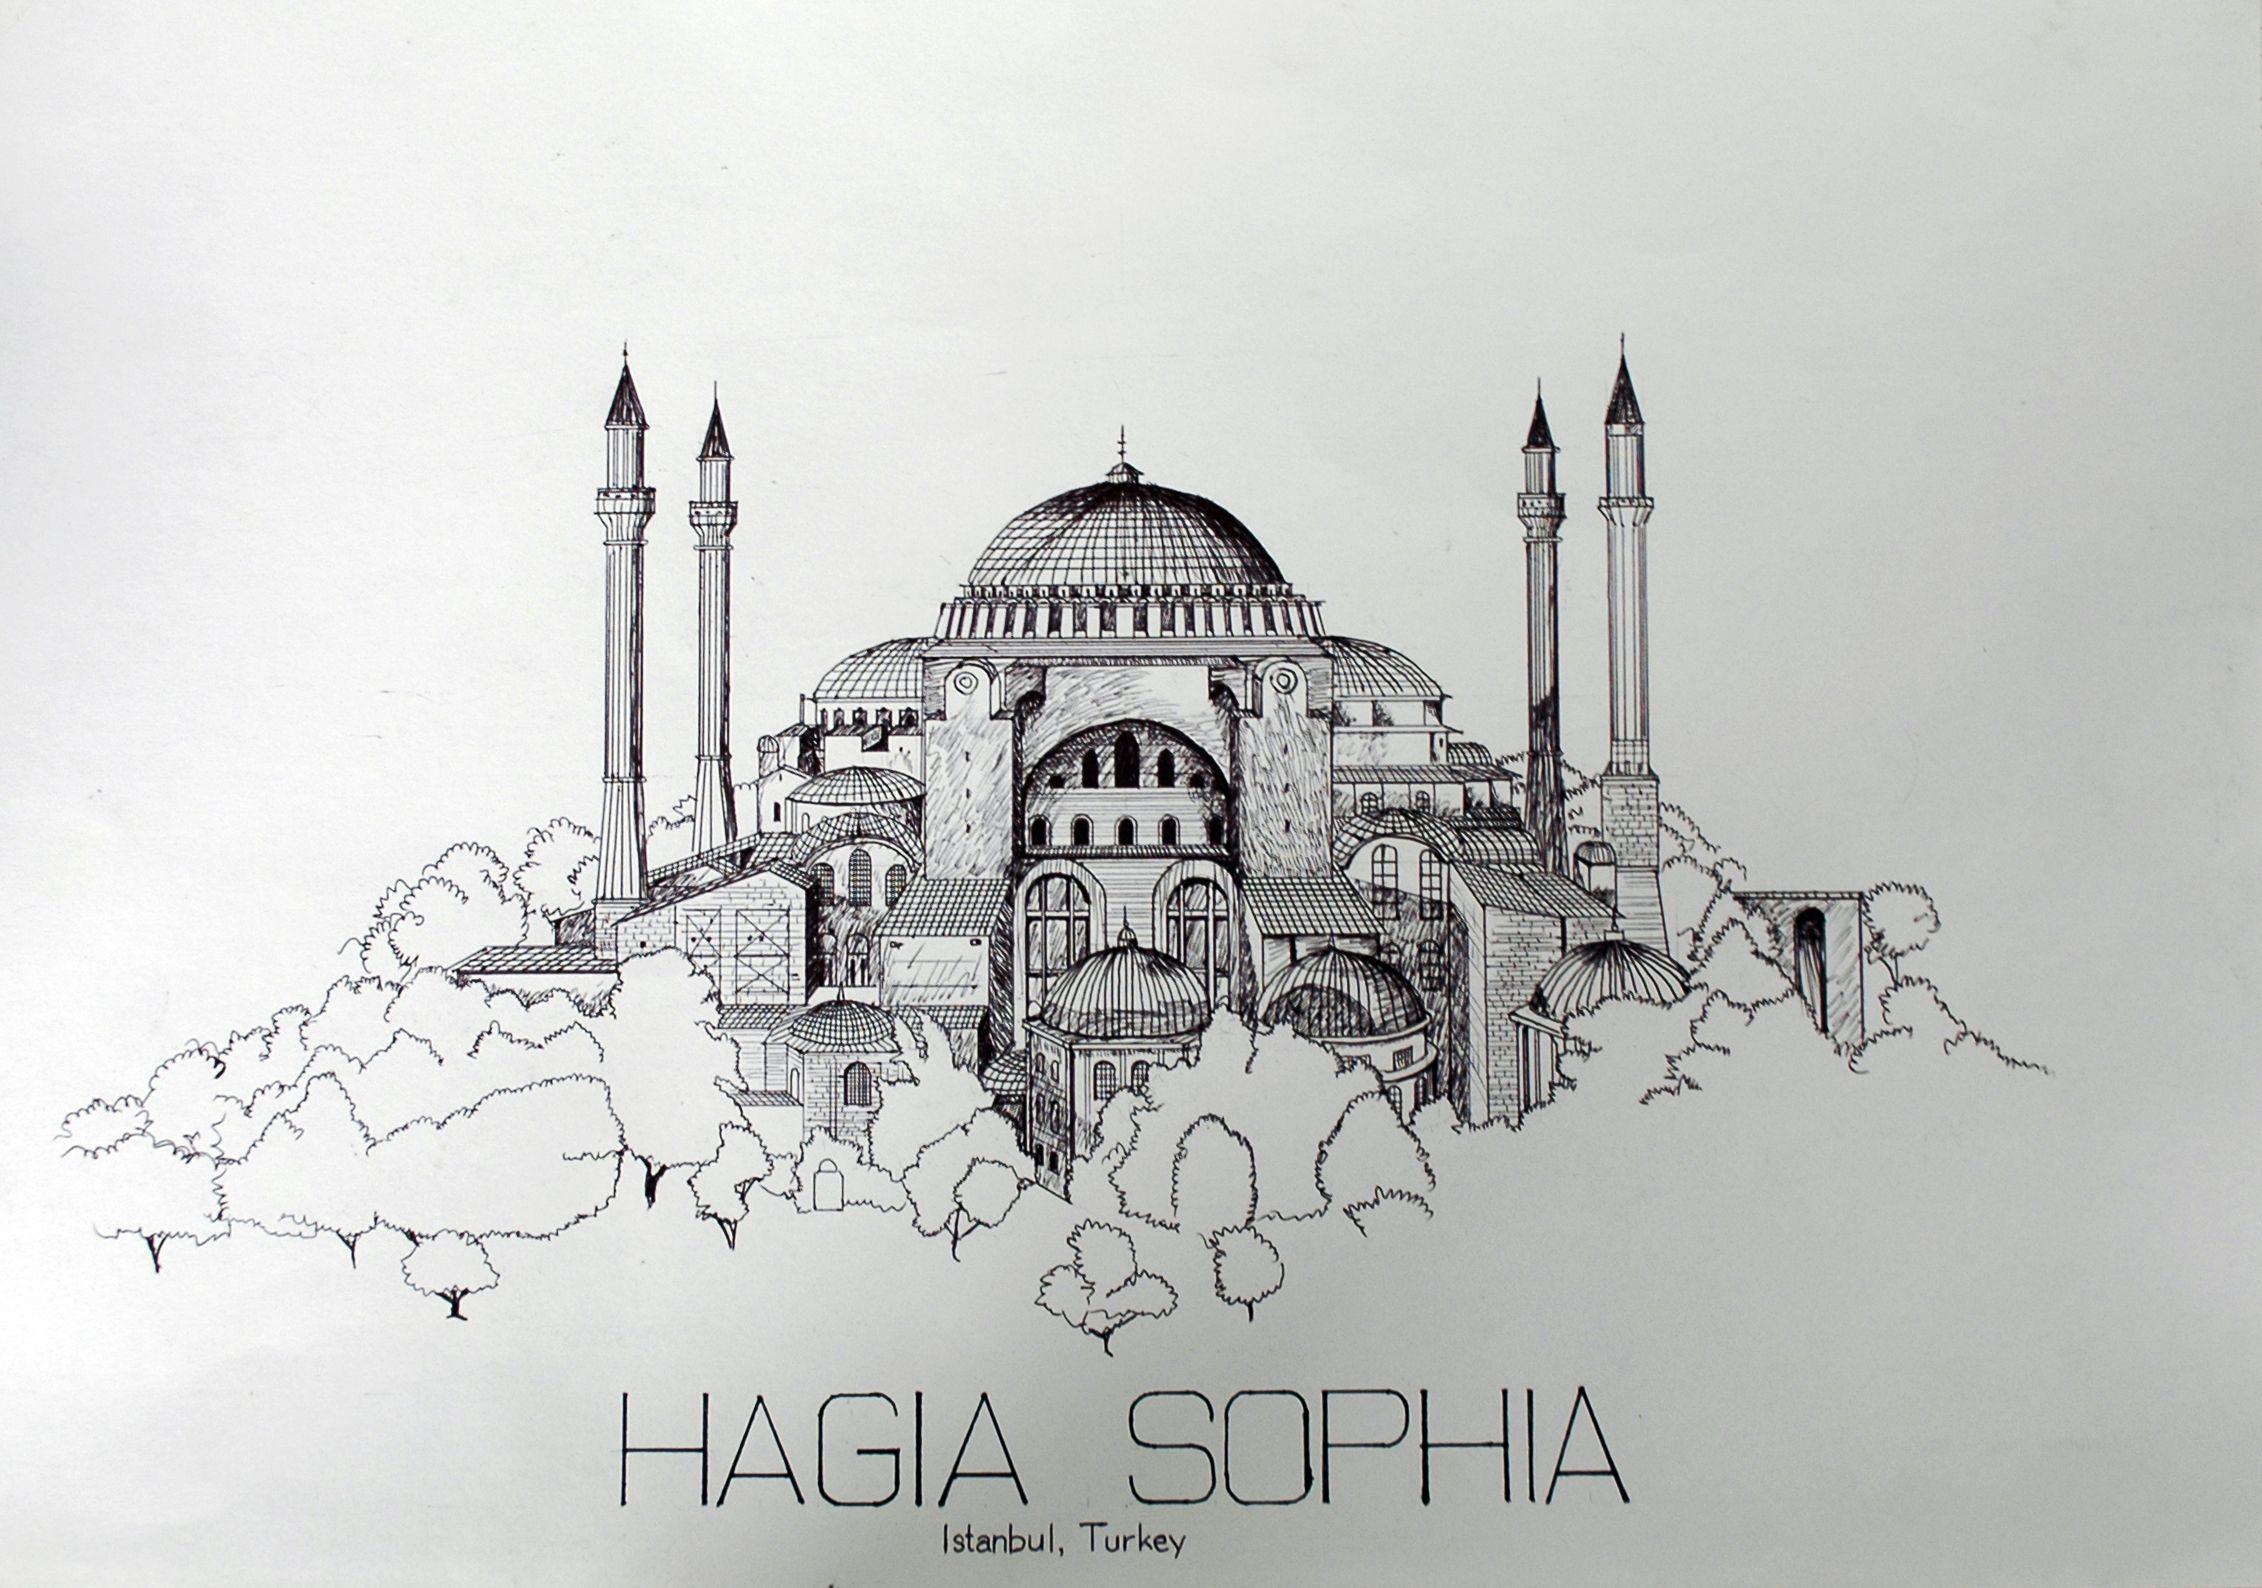 Archcom Hagia Sophia Of Istanbul Turkey Architecture Architecturesketch Hagiasophia Ayasofya Istanbul Turkey Mimari Cizim Taslaklari Sanat Resimler